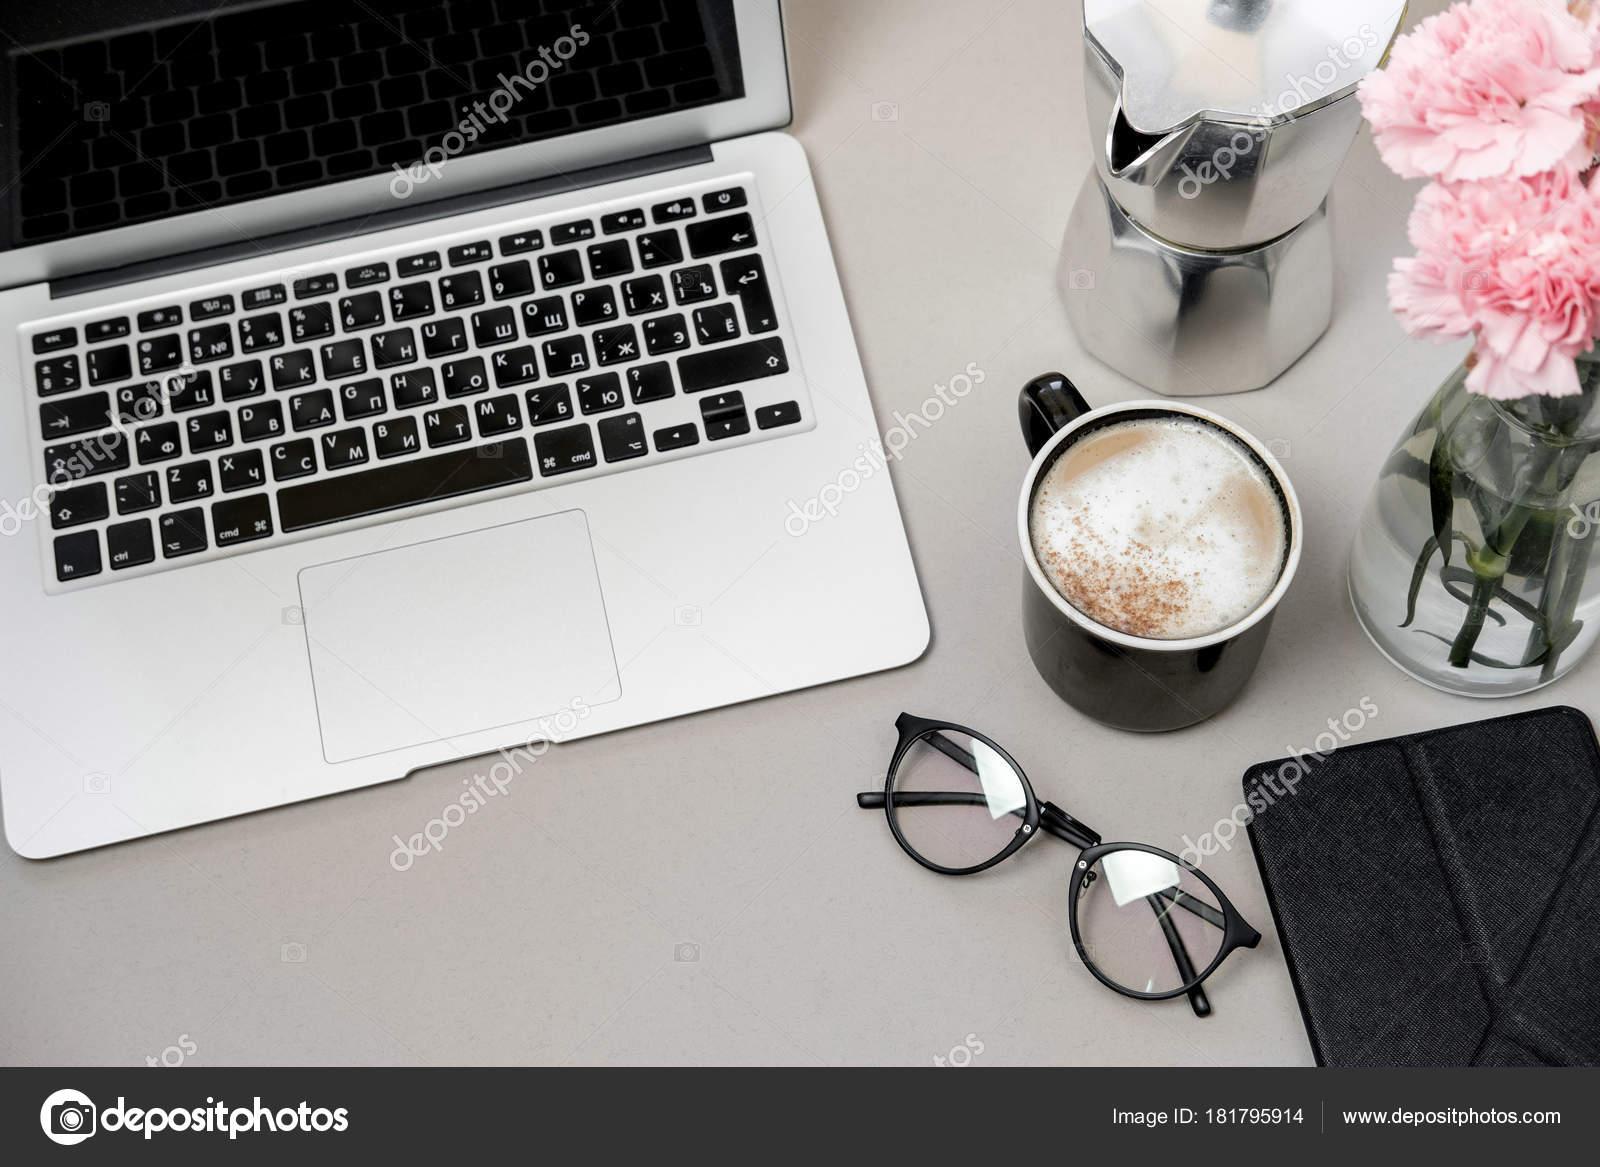 https depositphotos com 181795914 stock photo work space table laptop phone html